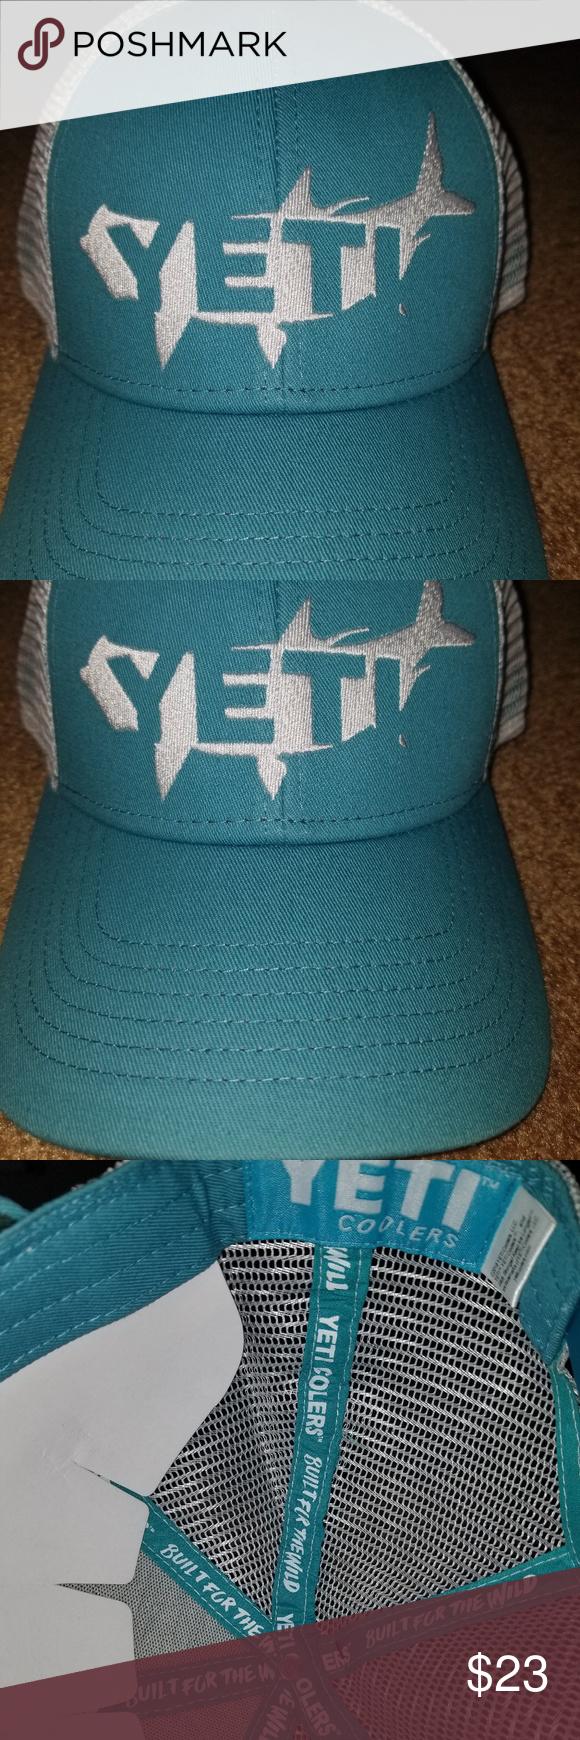 df24f4397a983 Yeti Coolers trucker hat Yeti Coolers Tarpon Trucker Hat Yeti Accessories  Hats